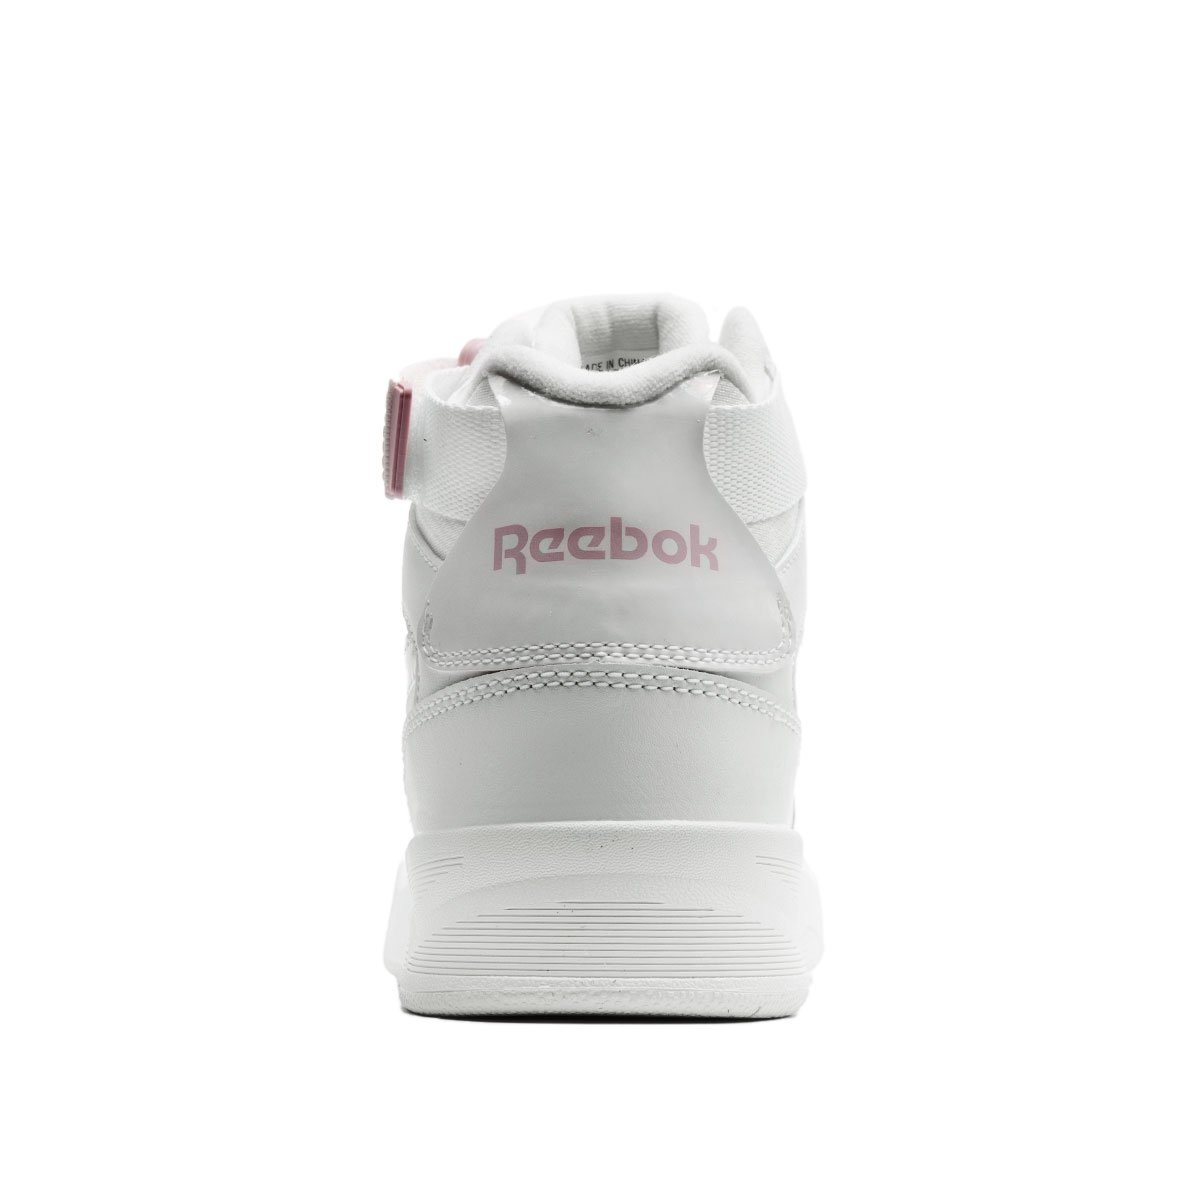 Reebok Royal BB4500 HI ST